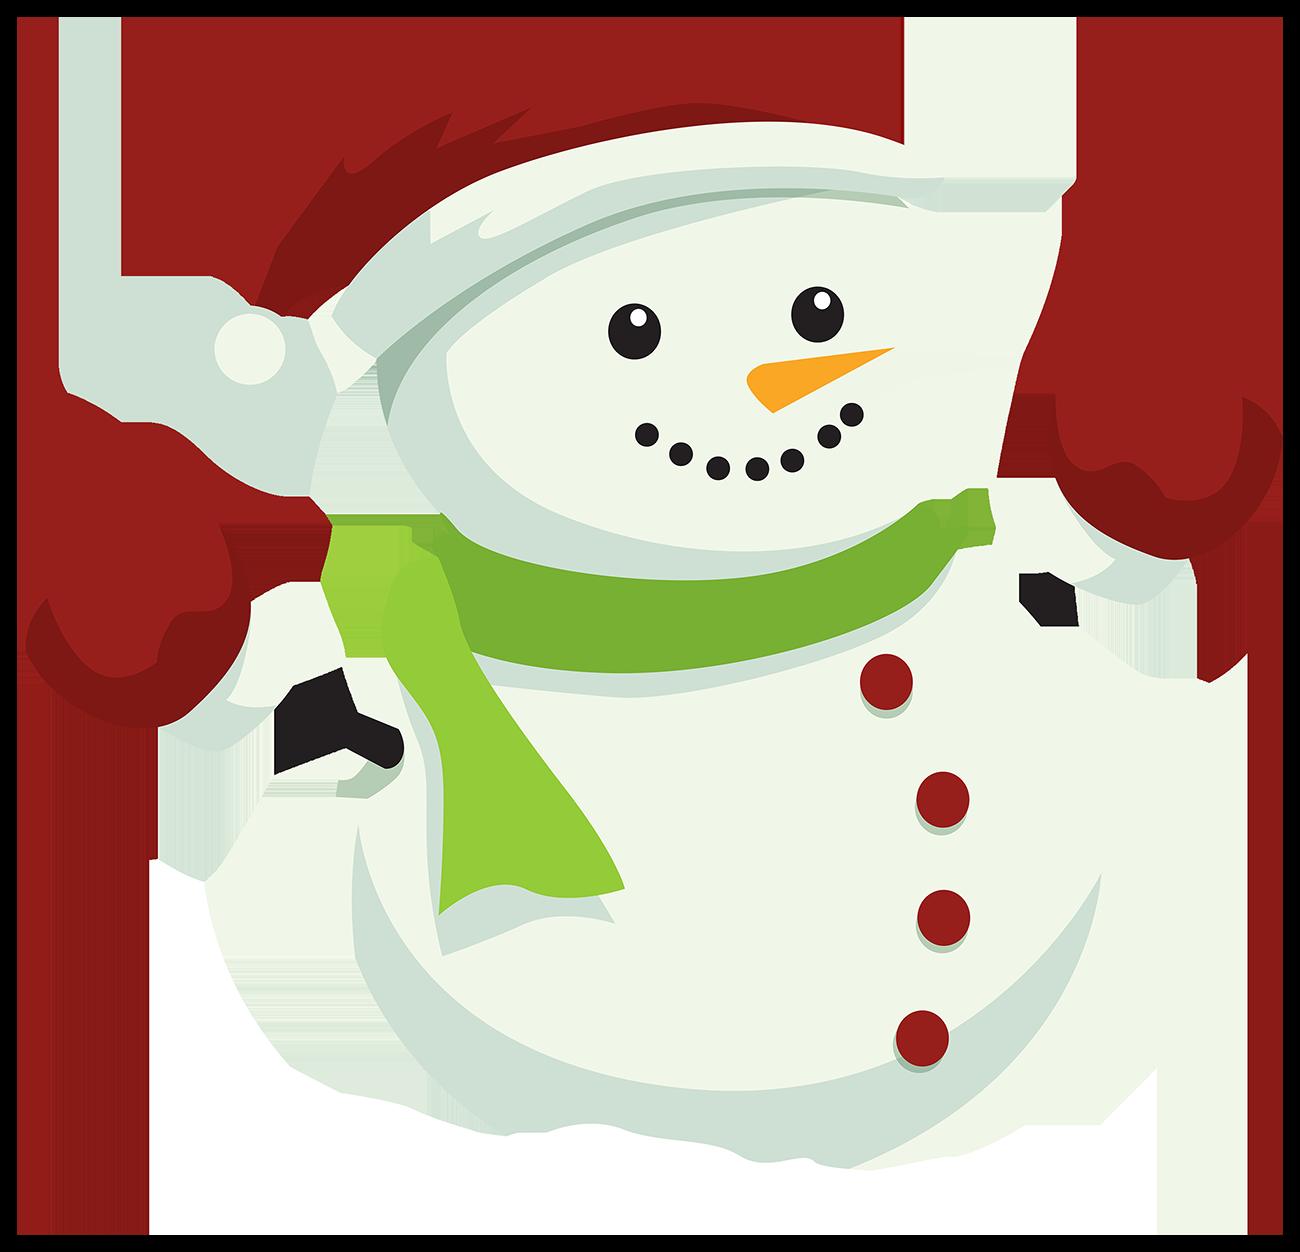 Снеговик - снеговик, новый год